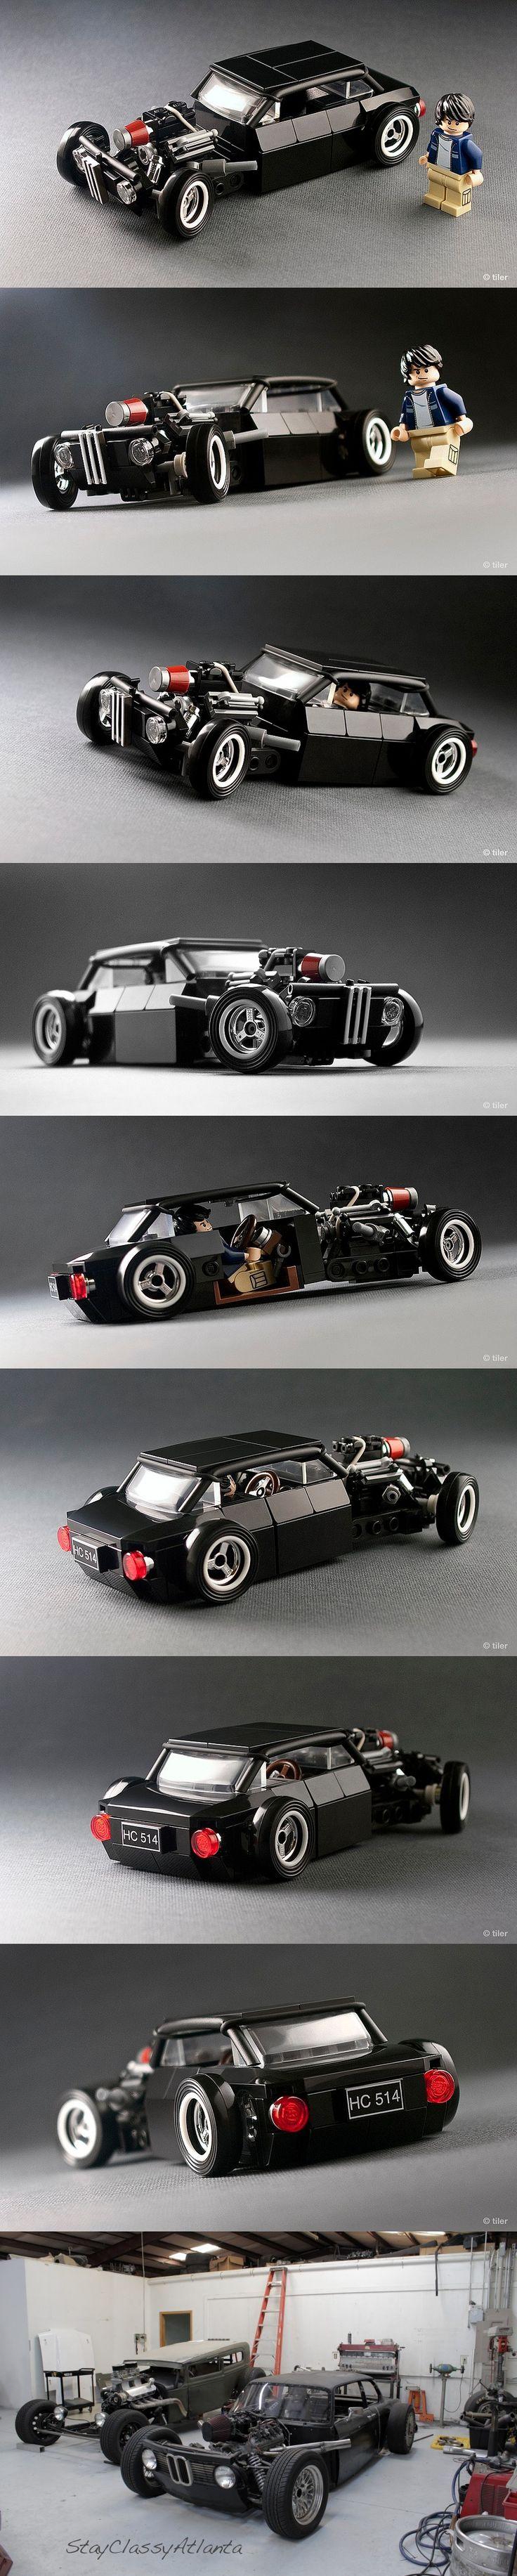 Gnarly BMW 2002 Rat Rod #BMW - a simply amazing little build